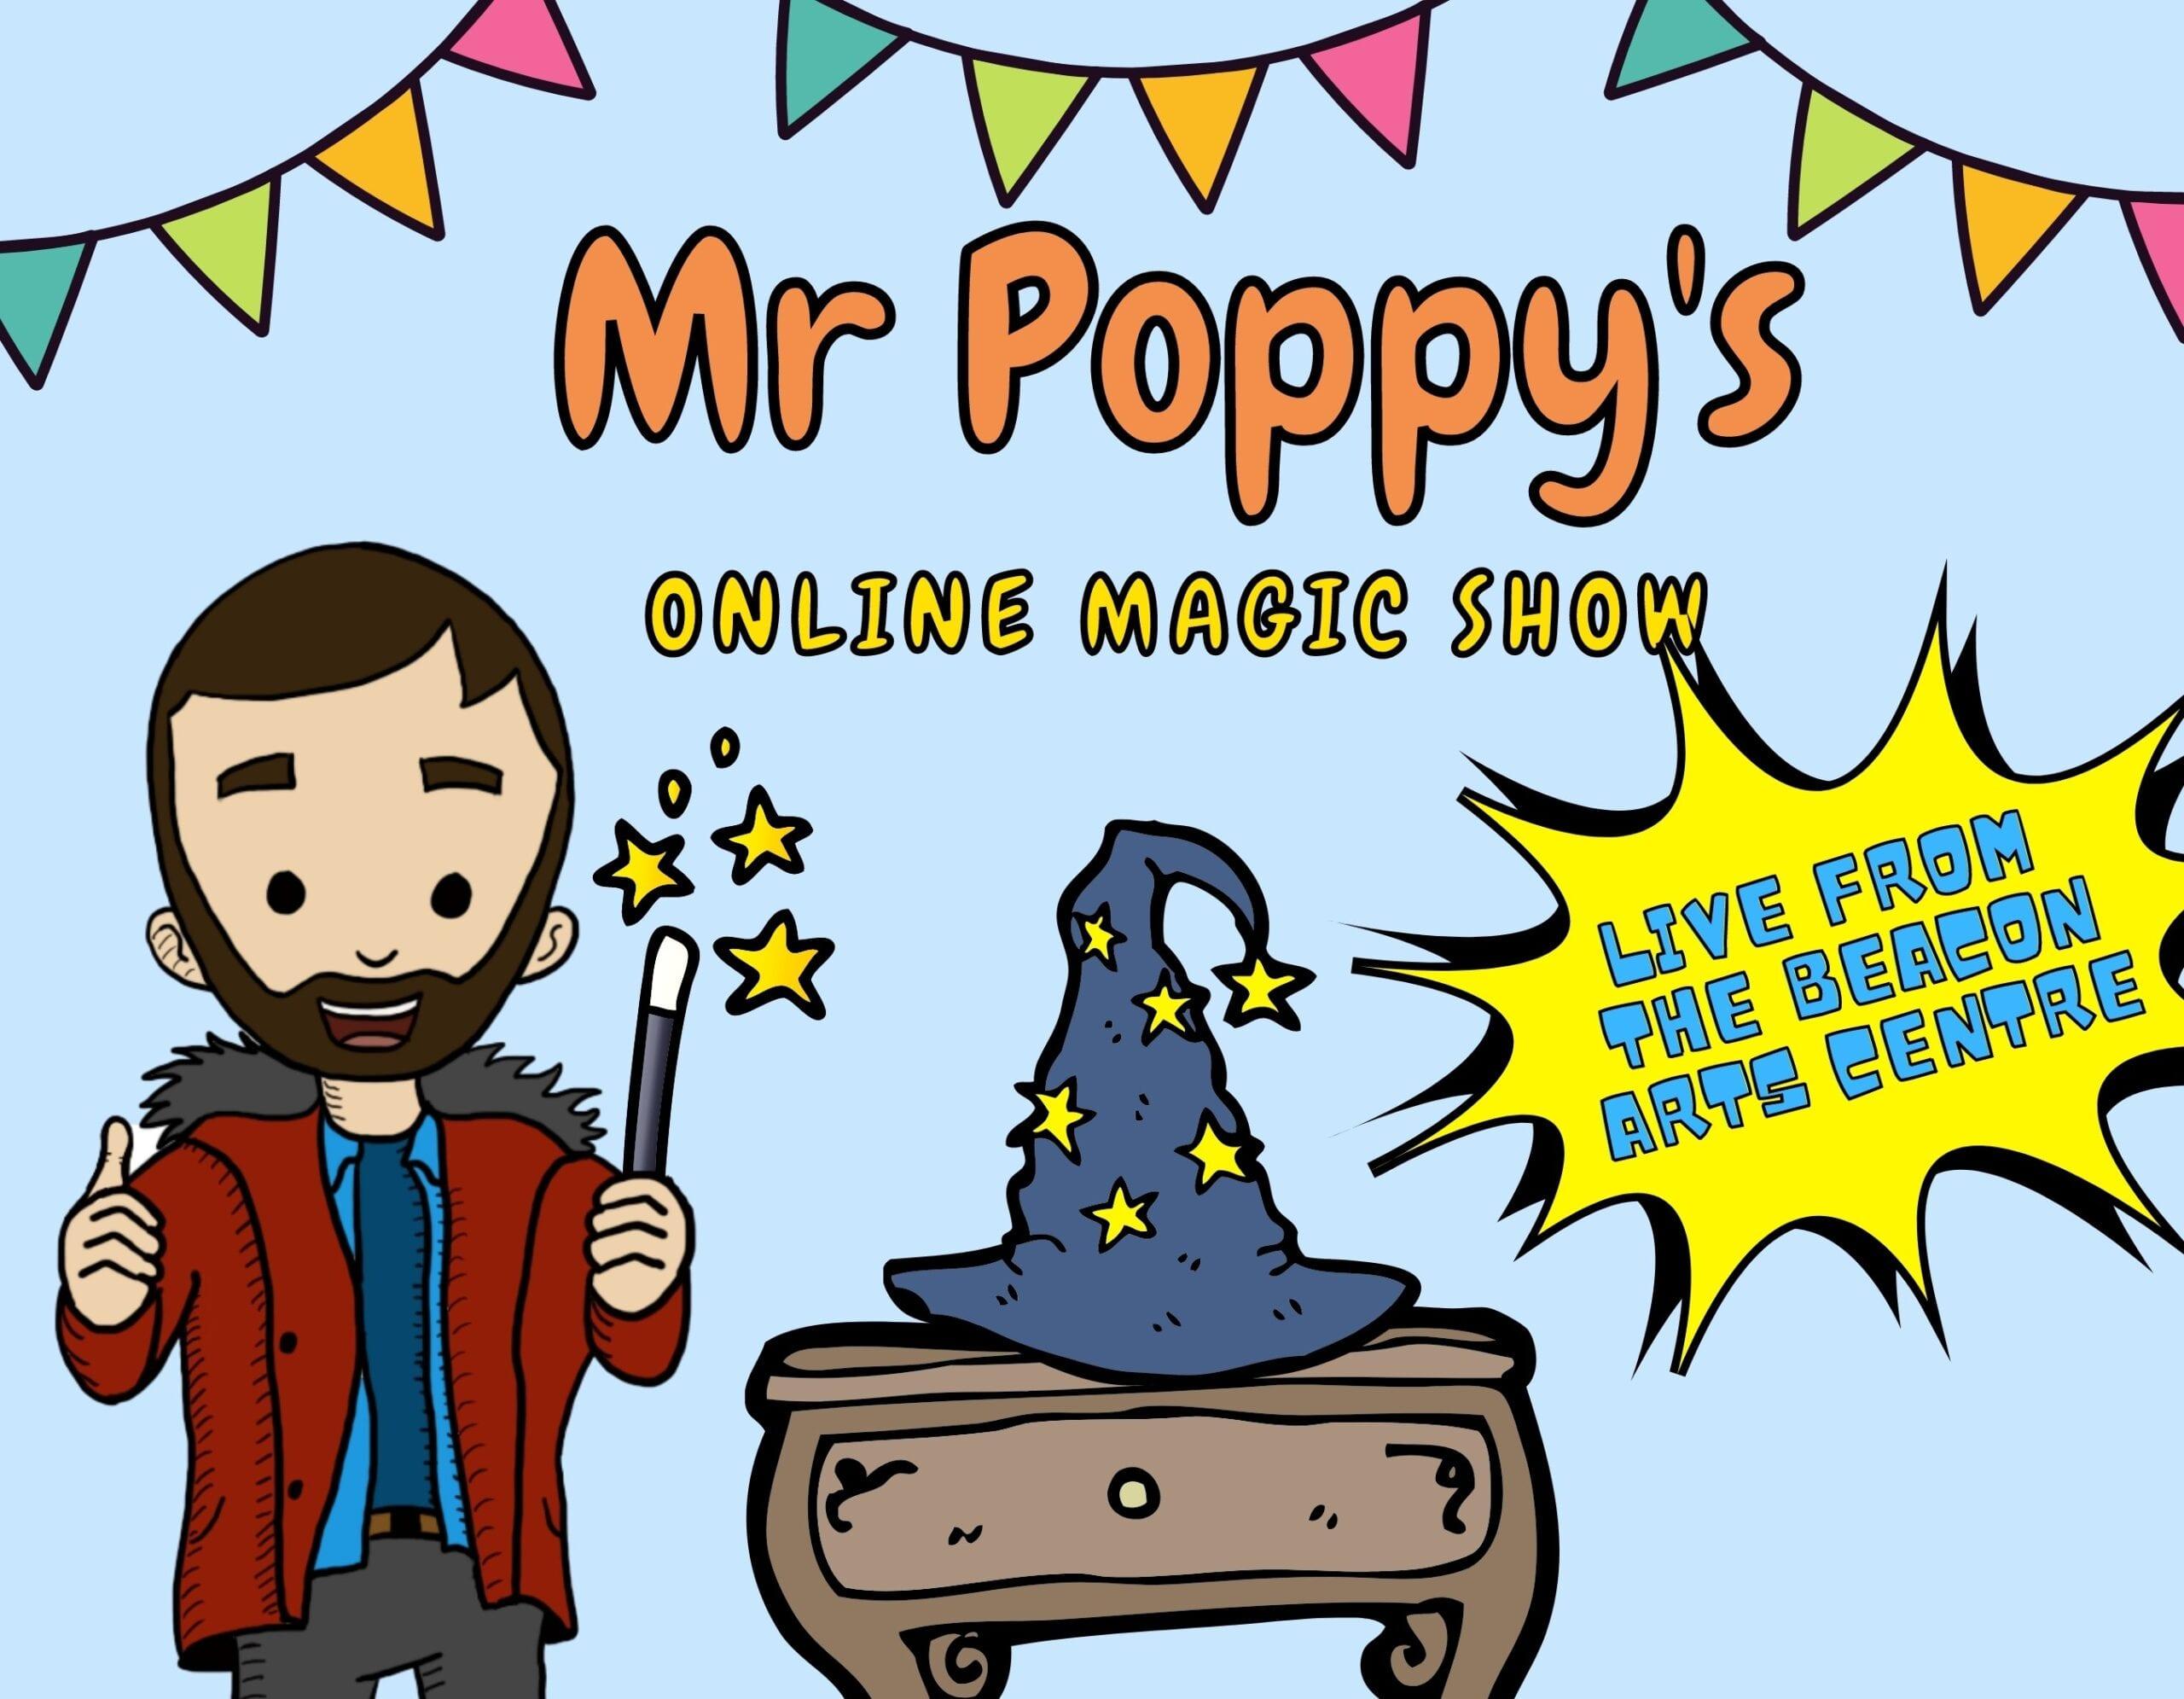 Mr Poppy's Online Magic Show